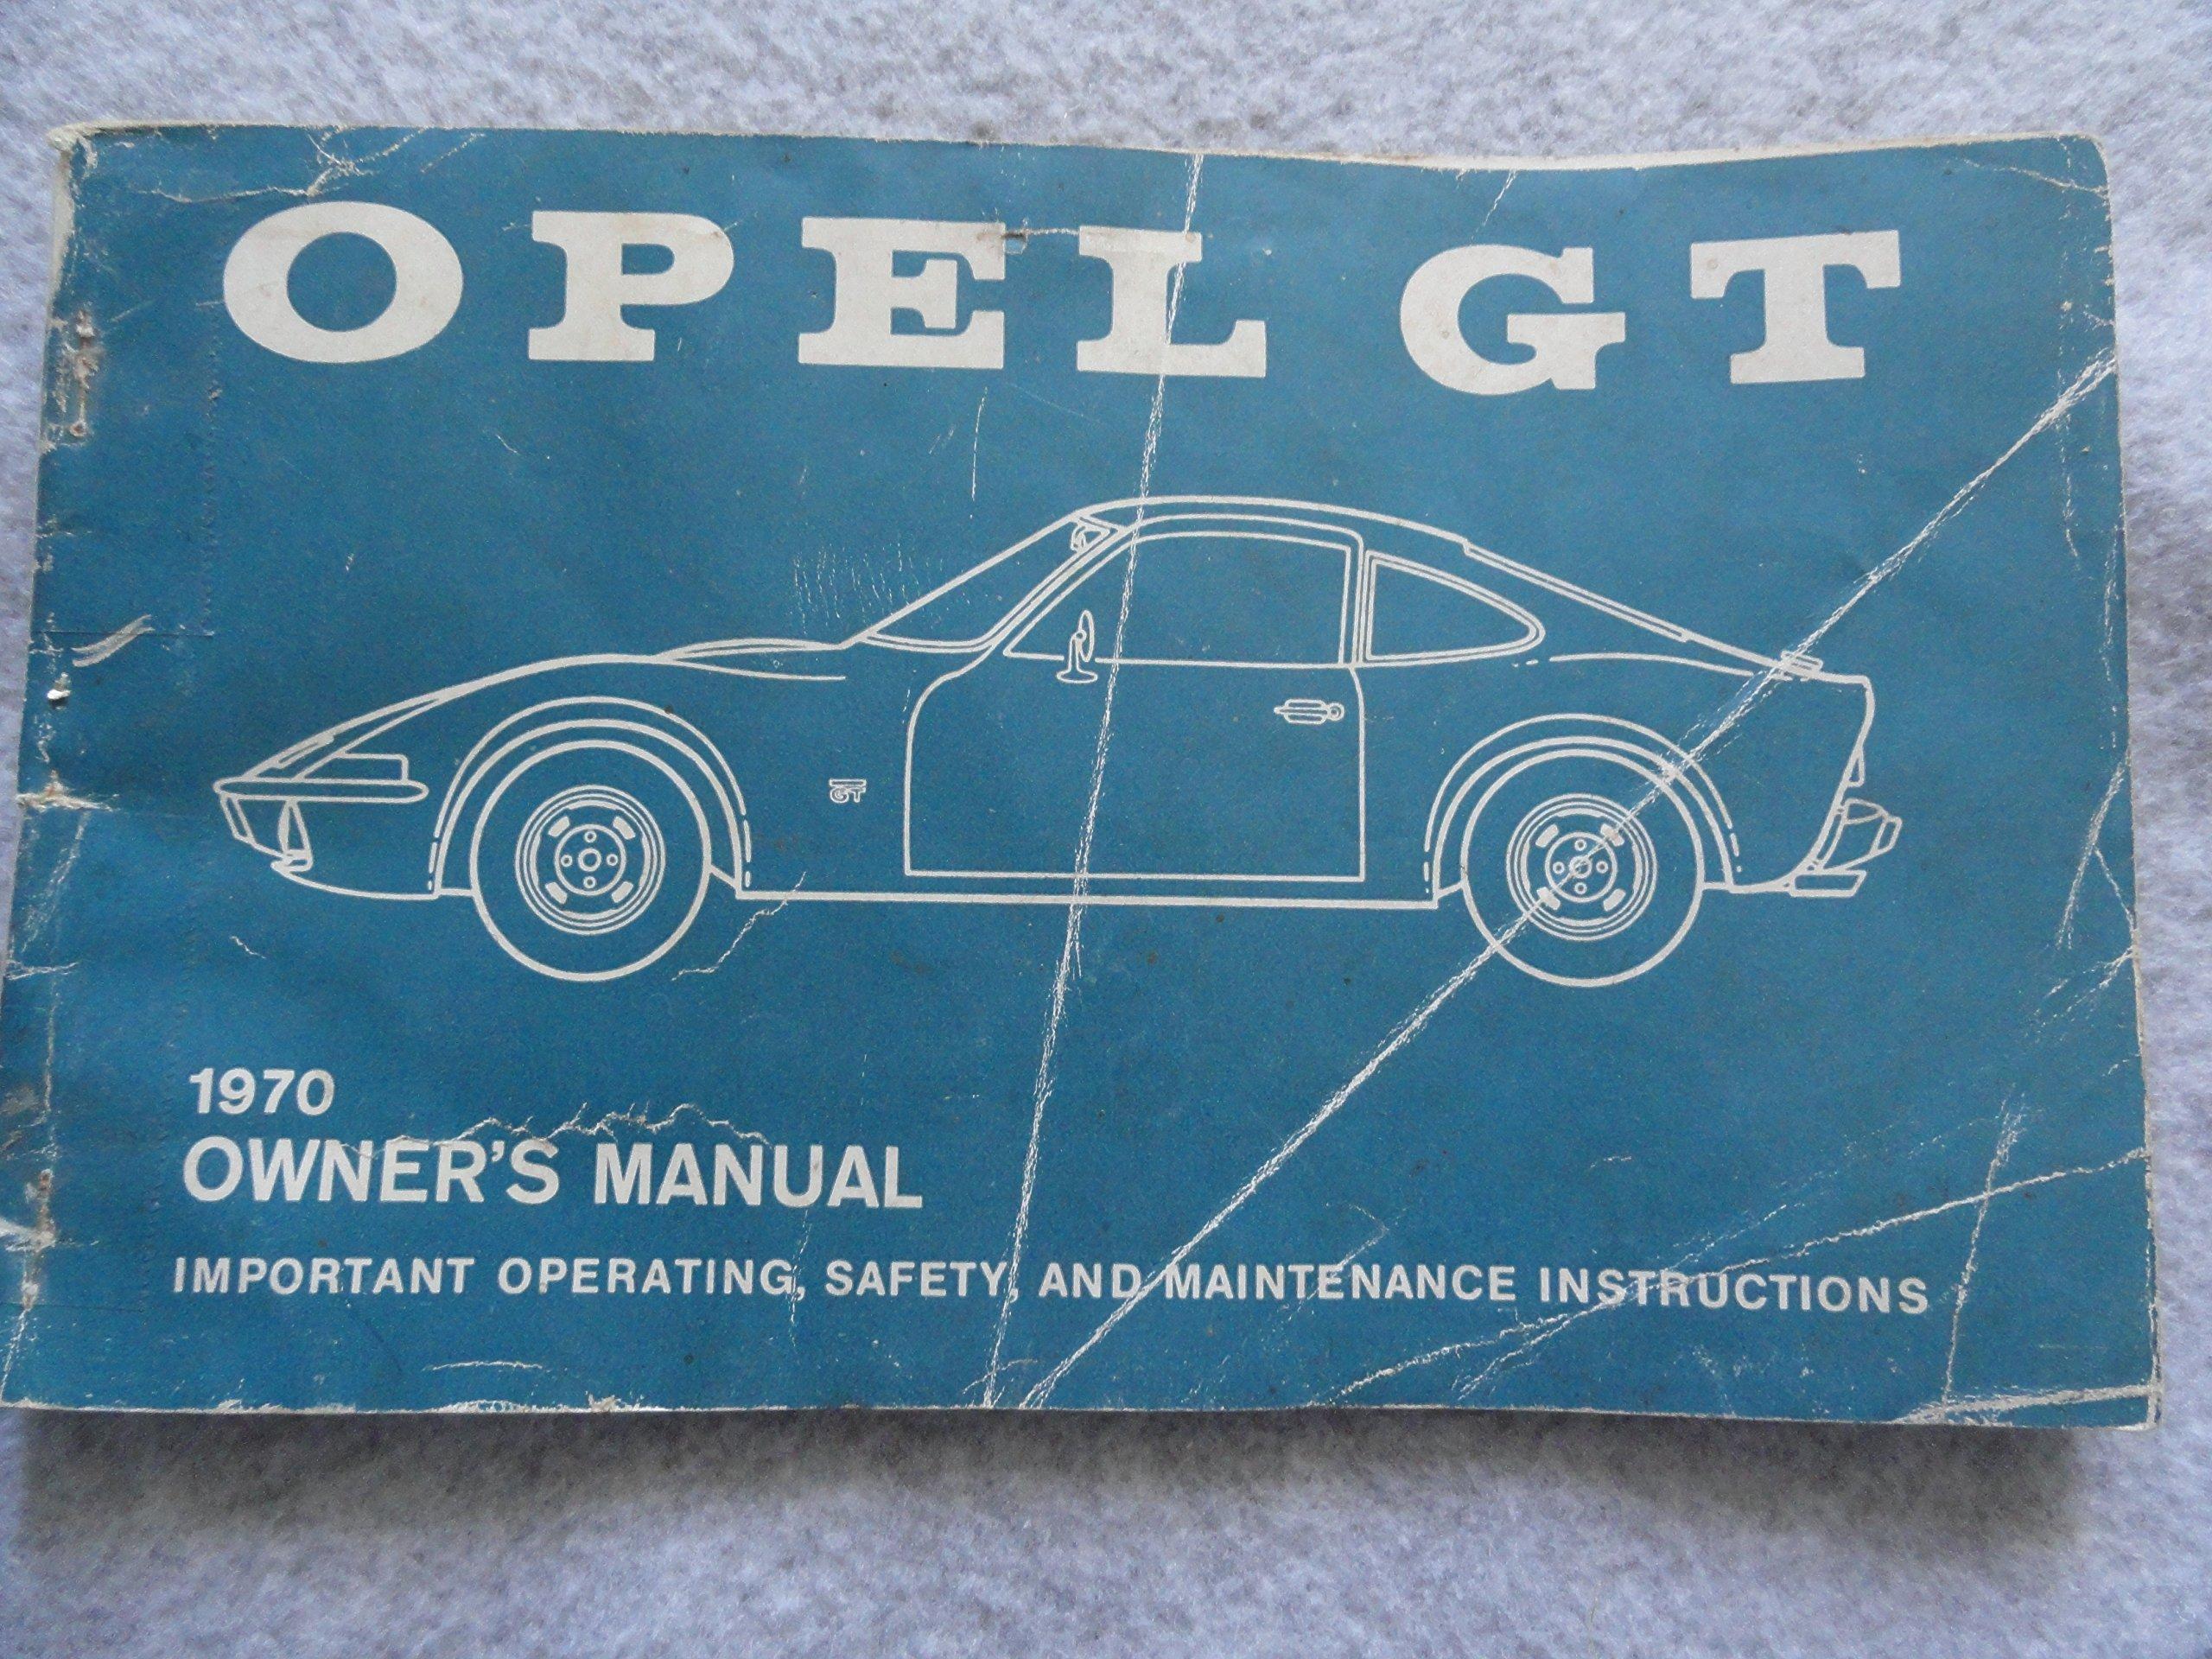 1970 opel gt owners manual paperback – 1970